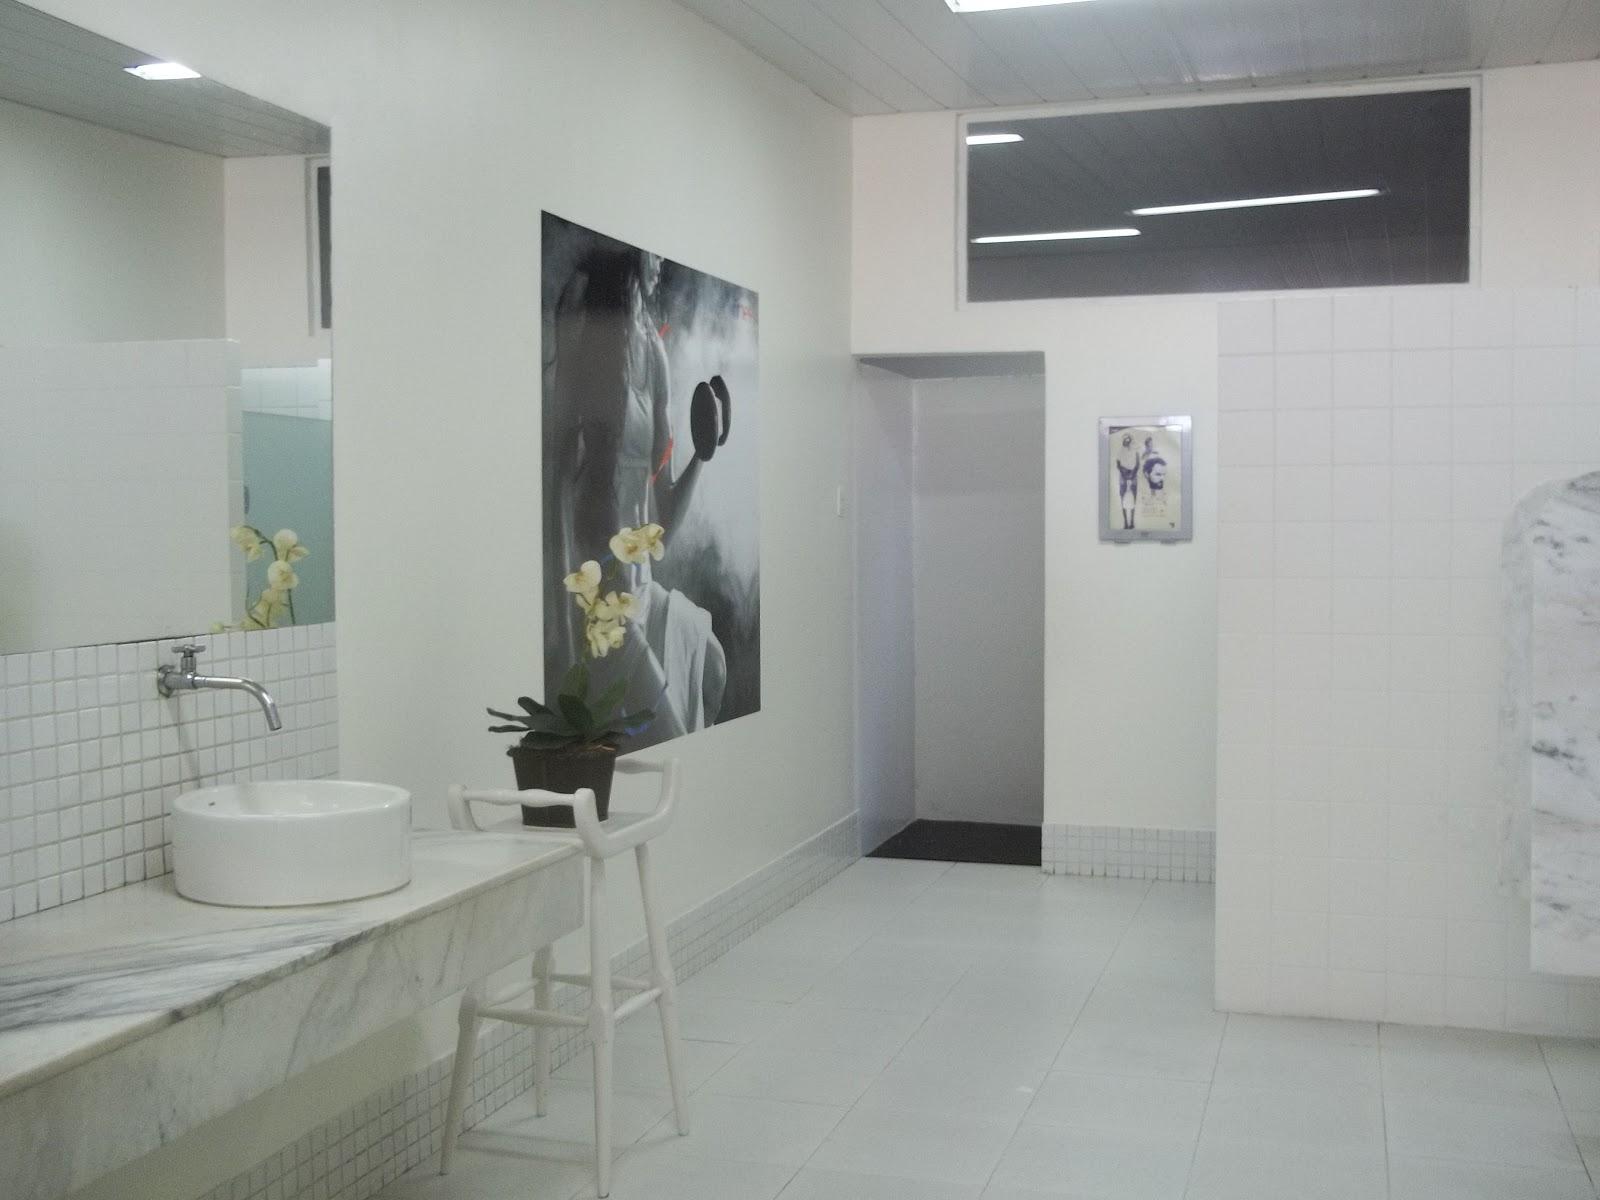 depois banheiro masculino depois banheiro masculino antes banheiro  #60666B 1600 1200